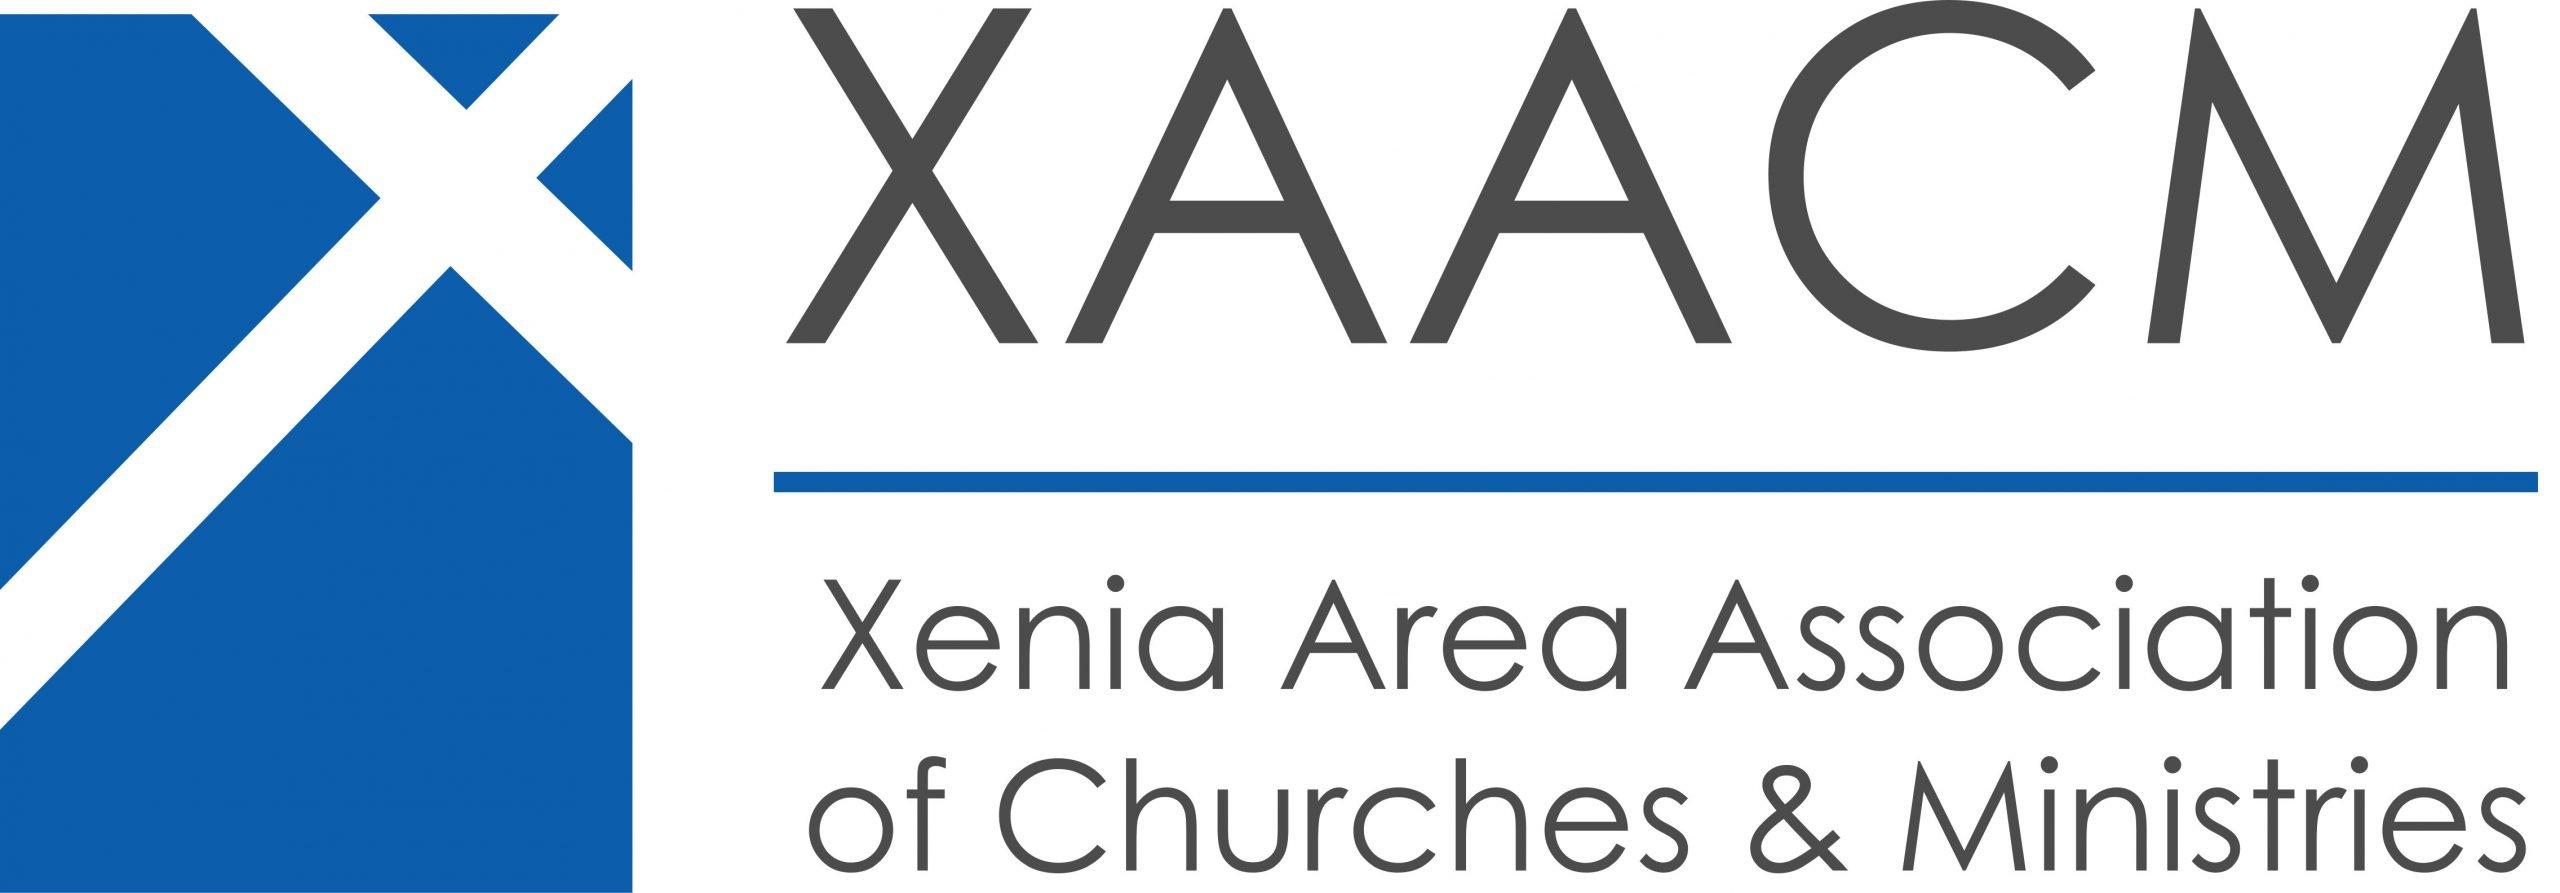 Xenia Area Association of Churches & Ministries